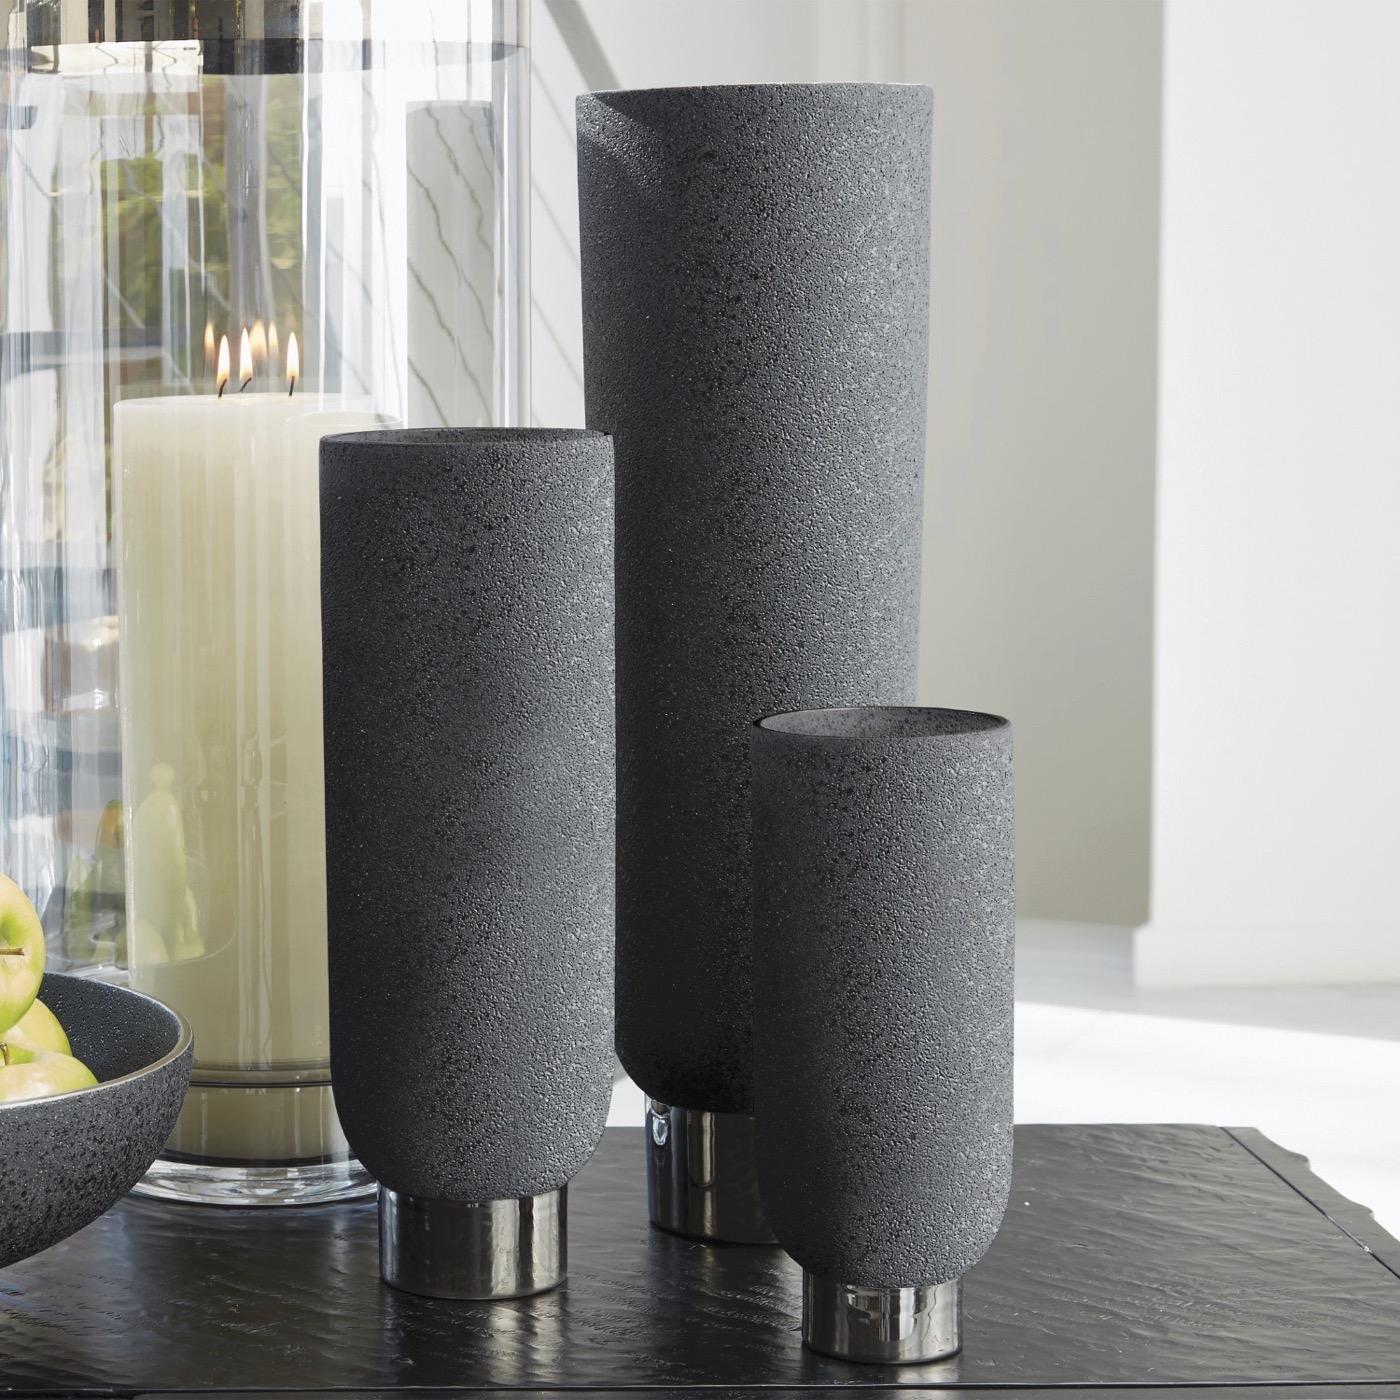 Cinder Ceramic Vases | Black